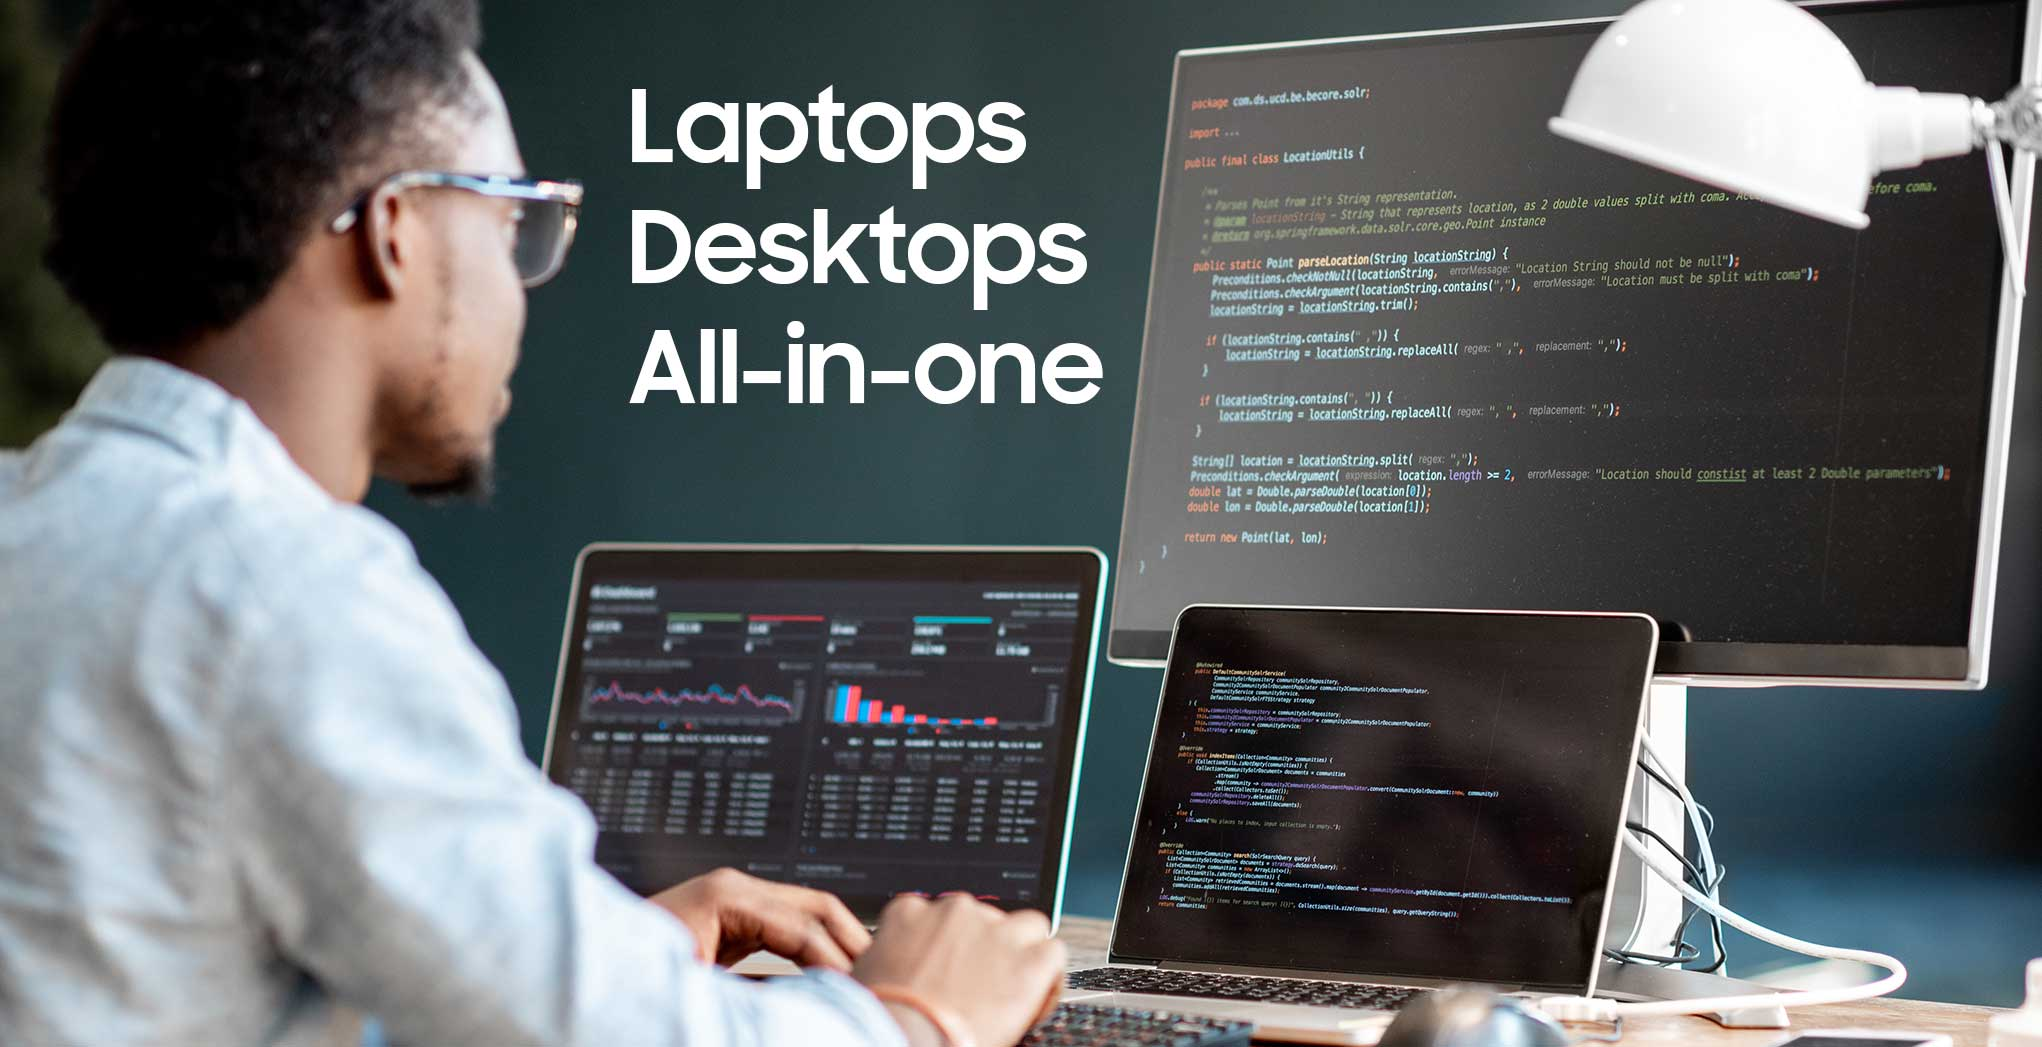 laptop-desktops.jpg